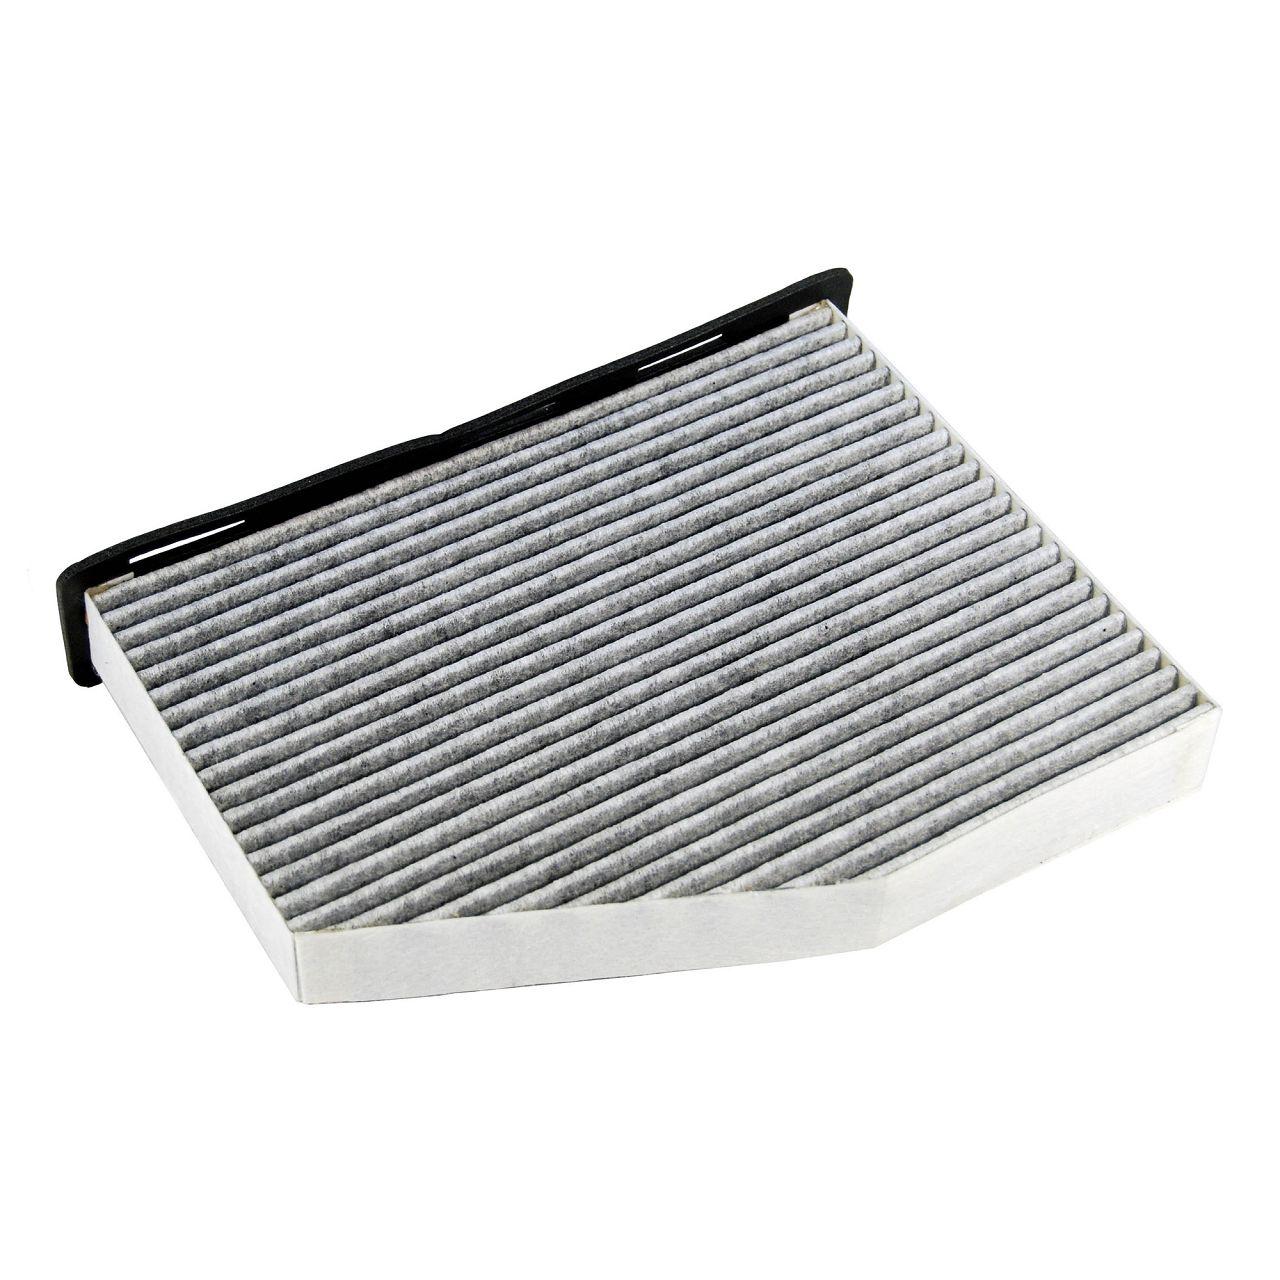 Inspektionskit Filterpaket Filterset für AUDI A8 (4H_) 4.2 FSI quattro 371 PS